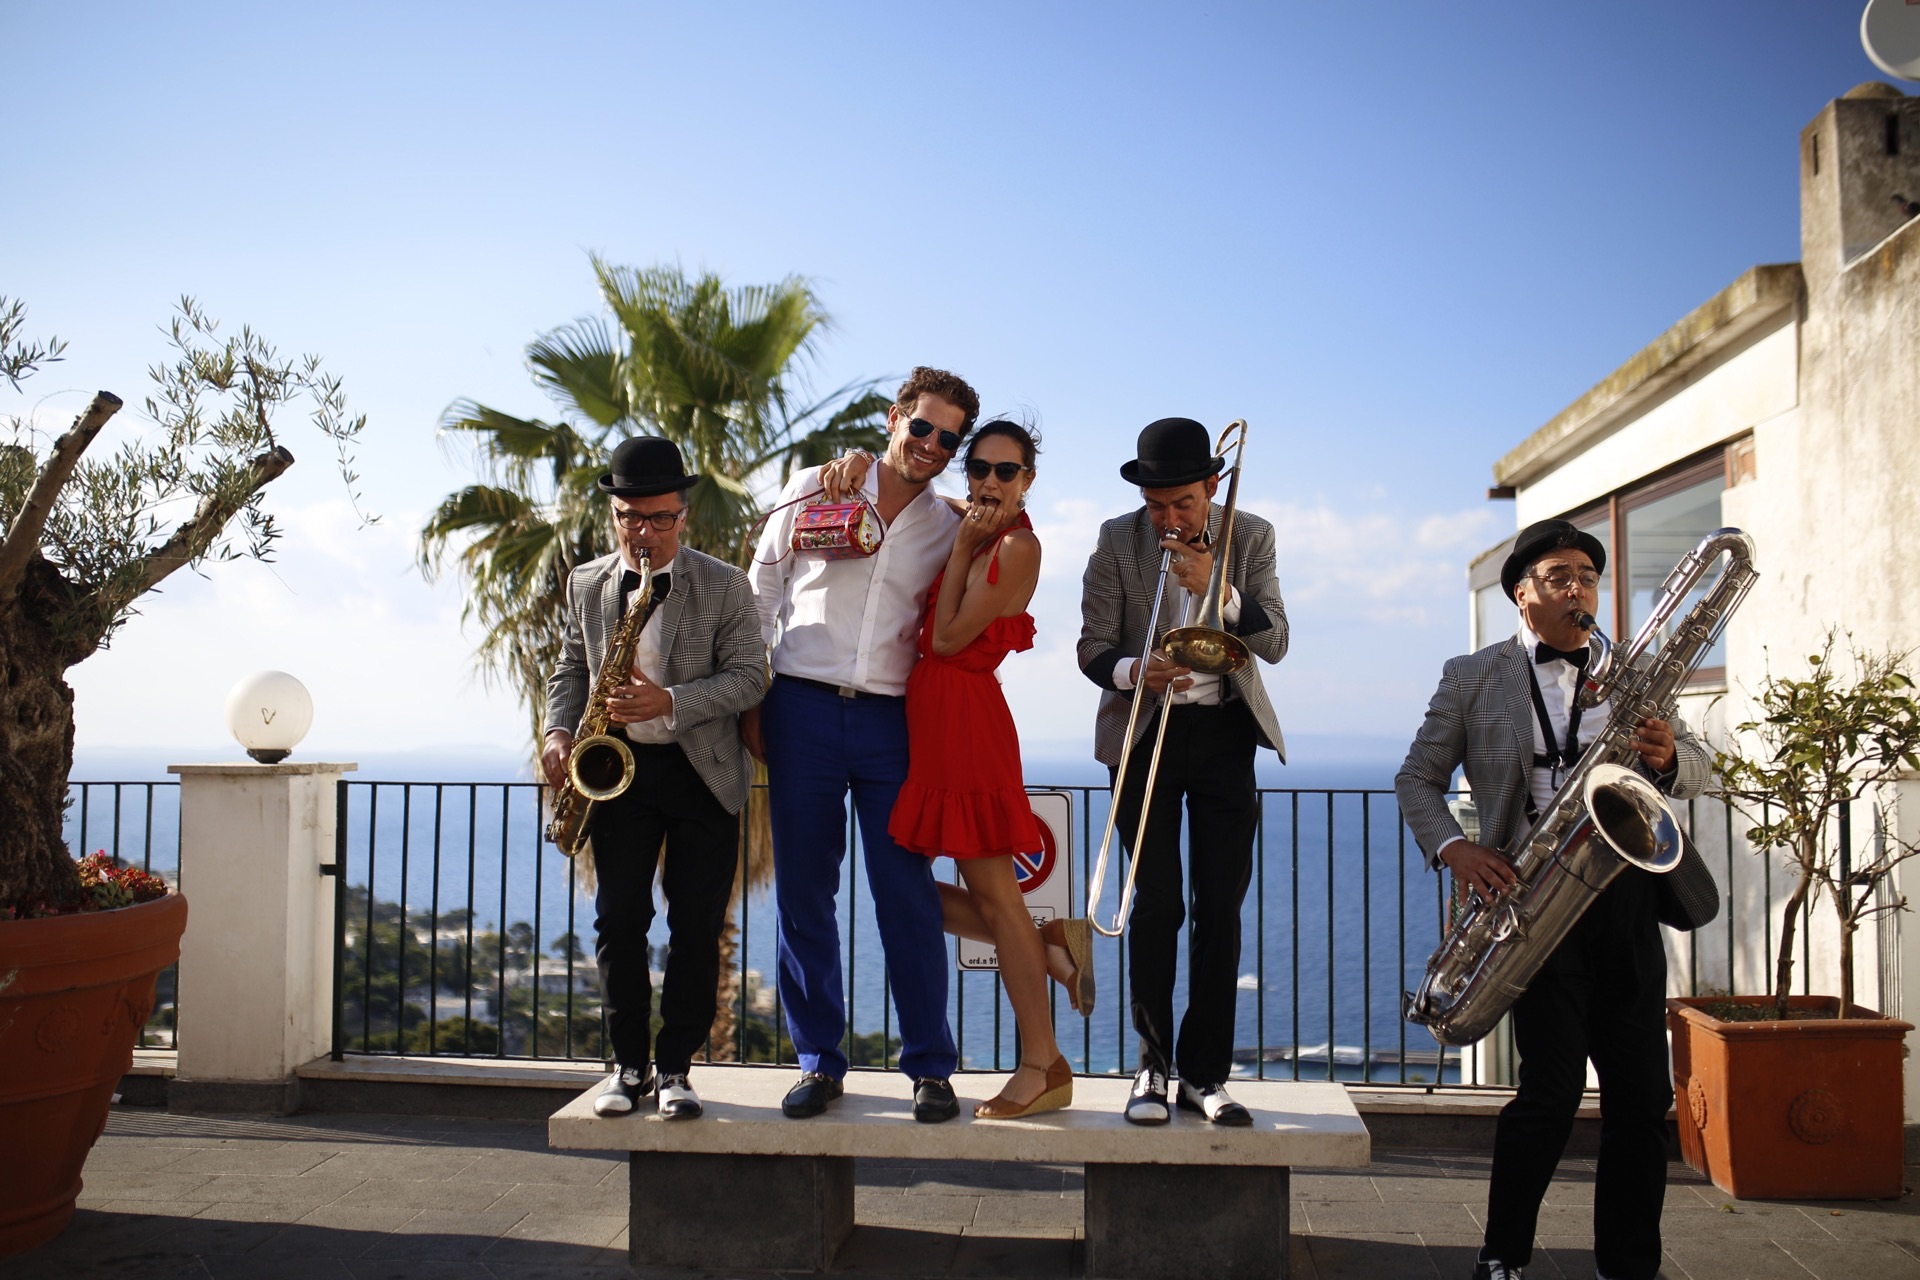 http://www.weddingamalfi.com/wp-content/uploads/Day-2-nathalie-and-banjamin-in-Capri.jpg